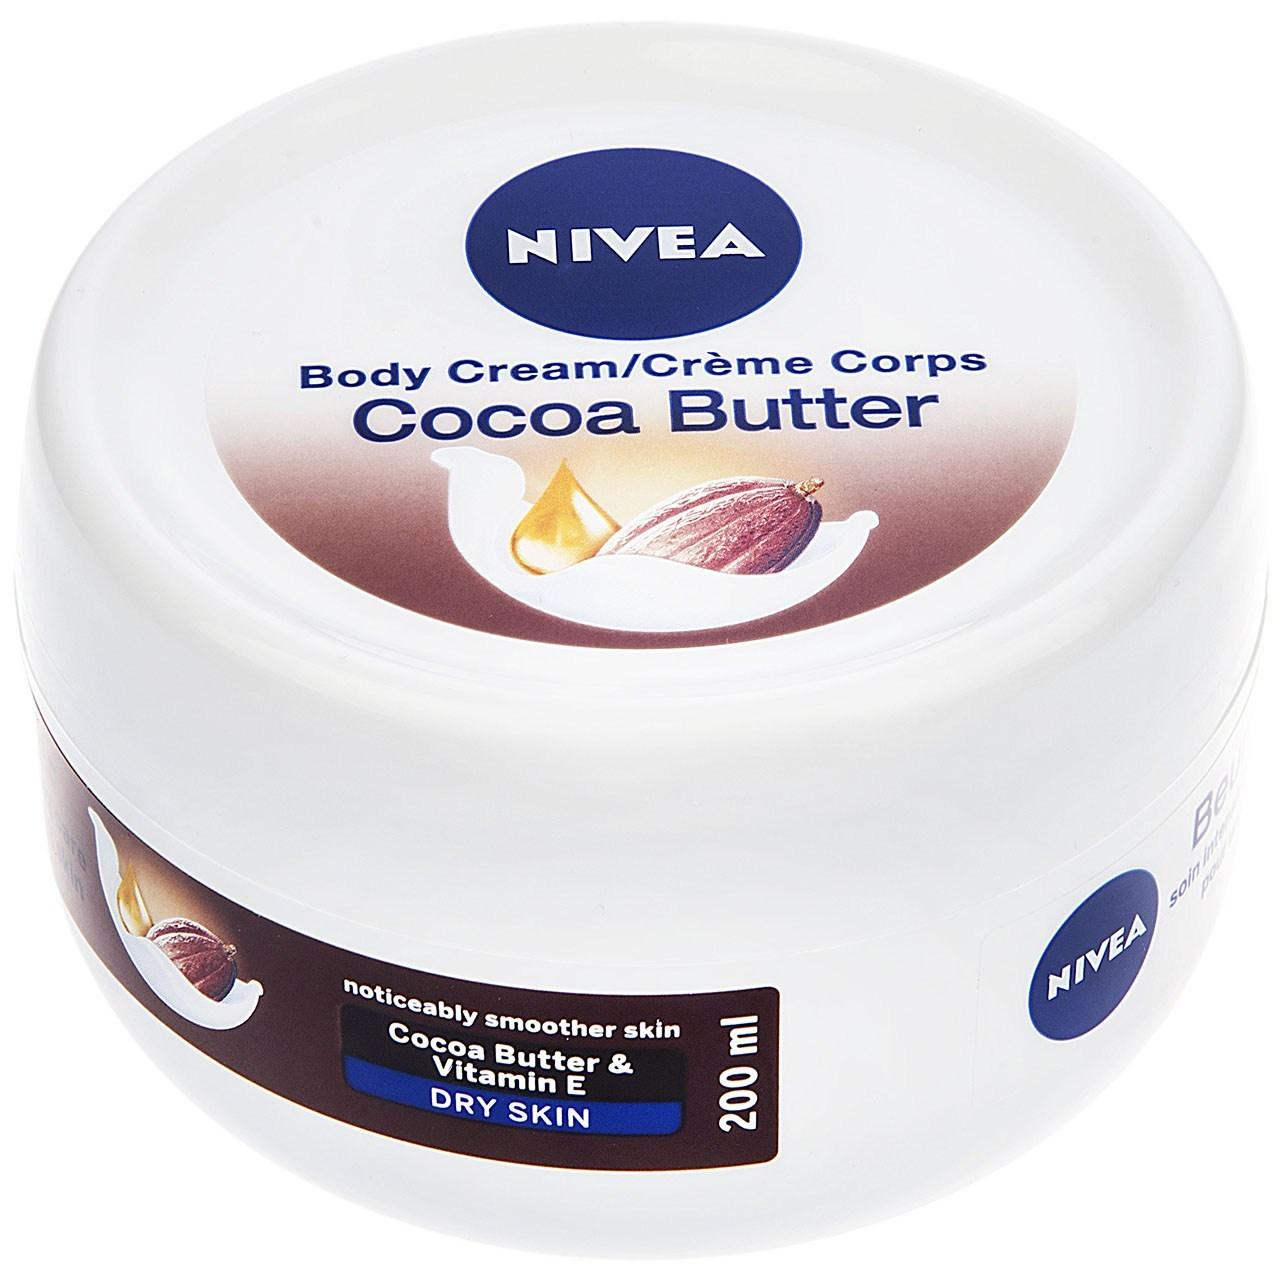 قیمت کرم بدن نیوآ مدل Cocoa Butter حجم 200 میلیلیتر